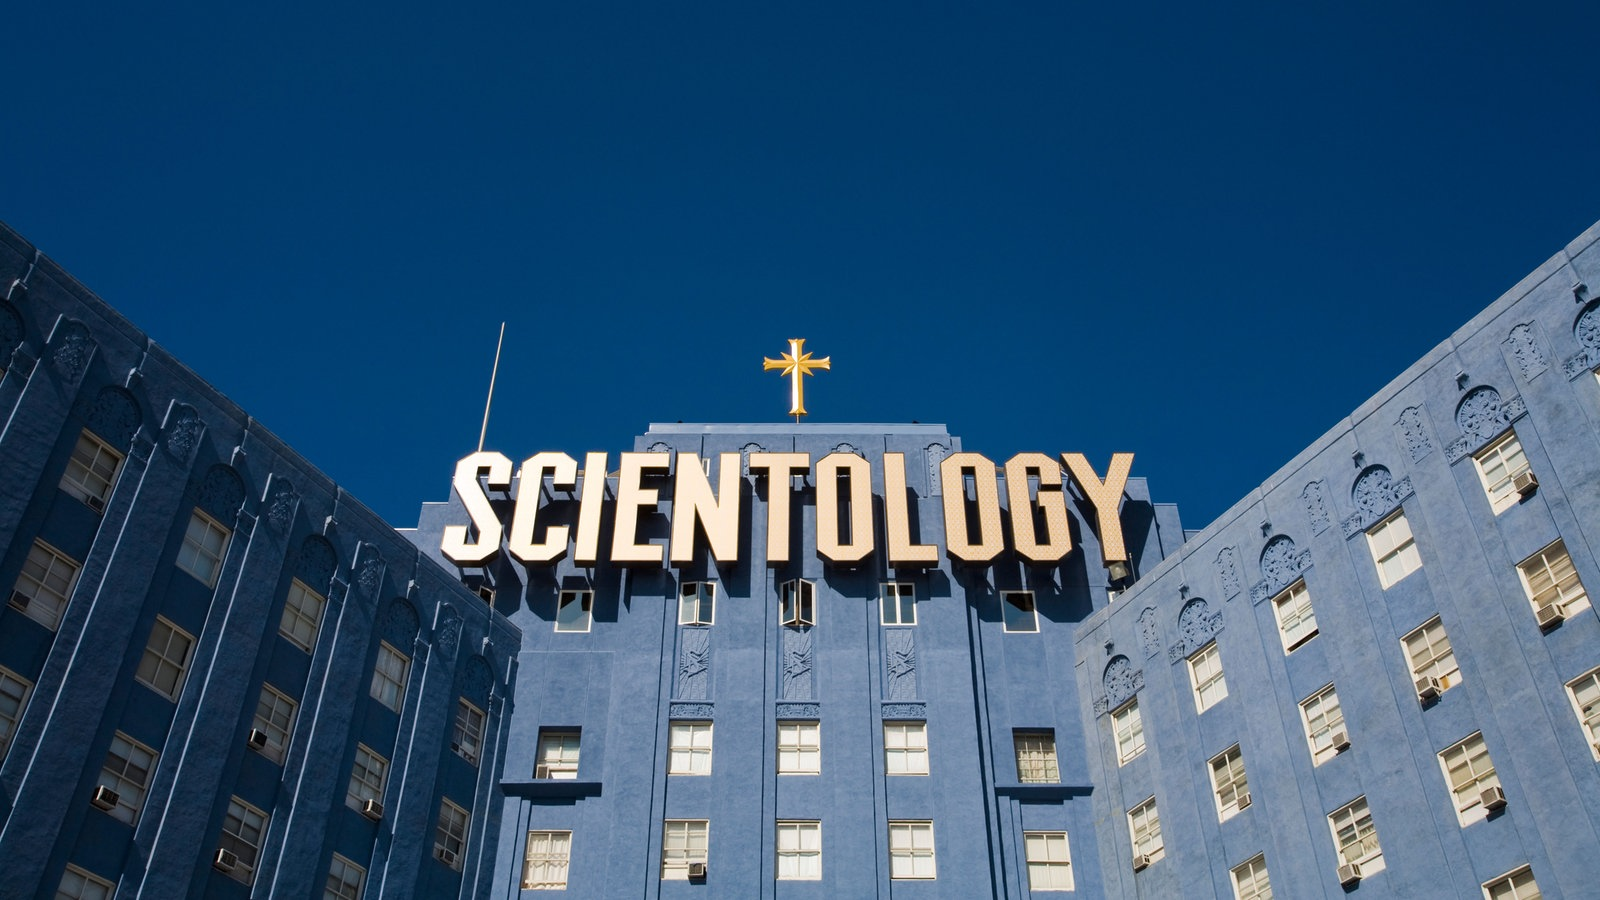 Scientology Kirchen